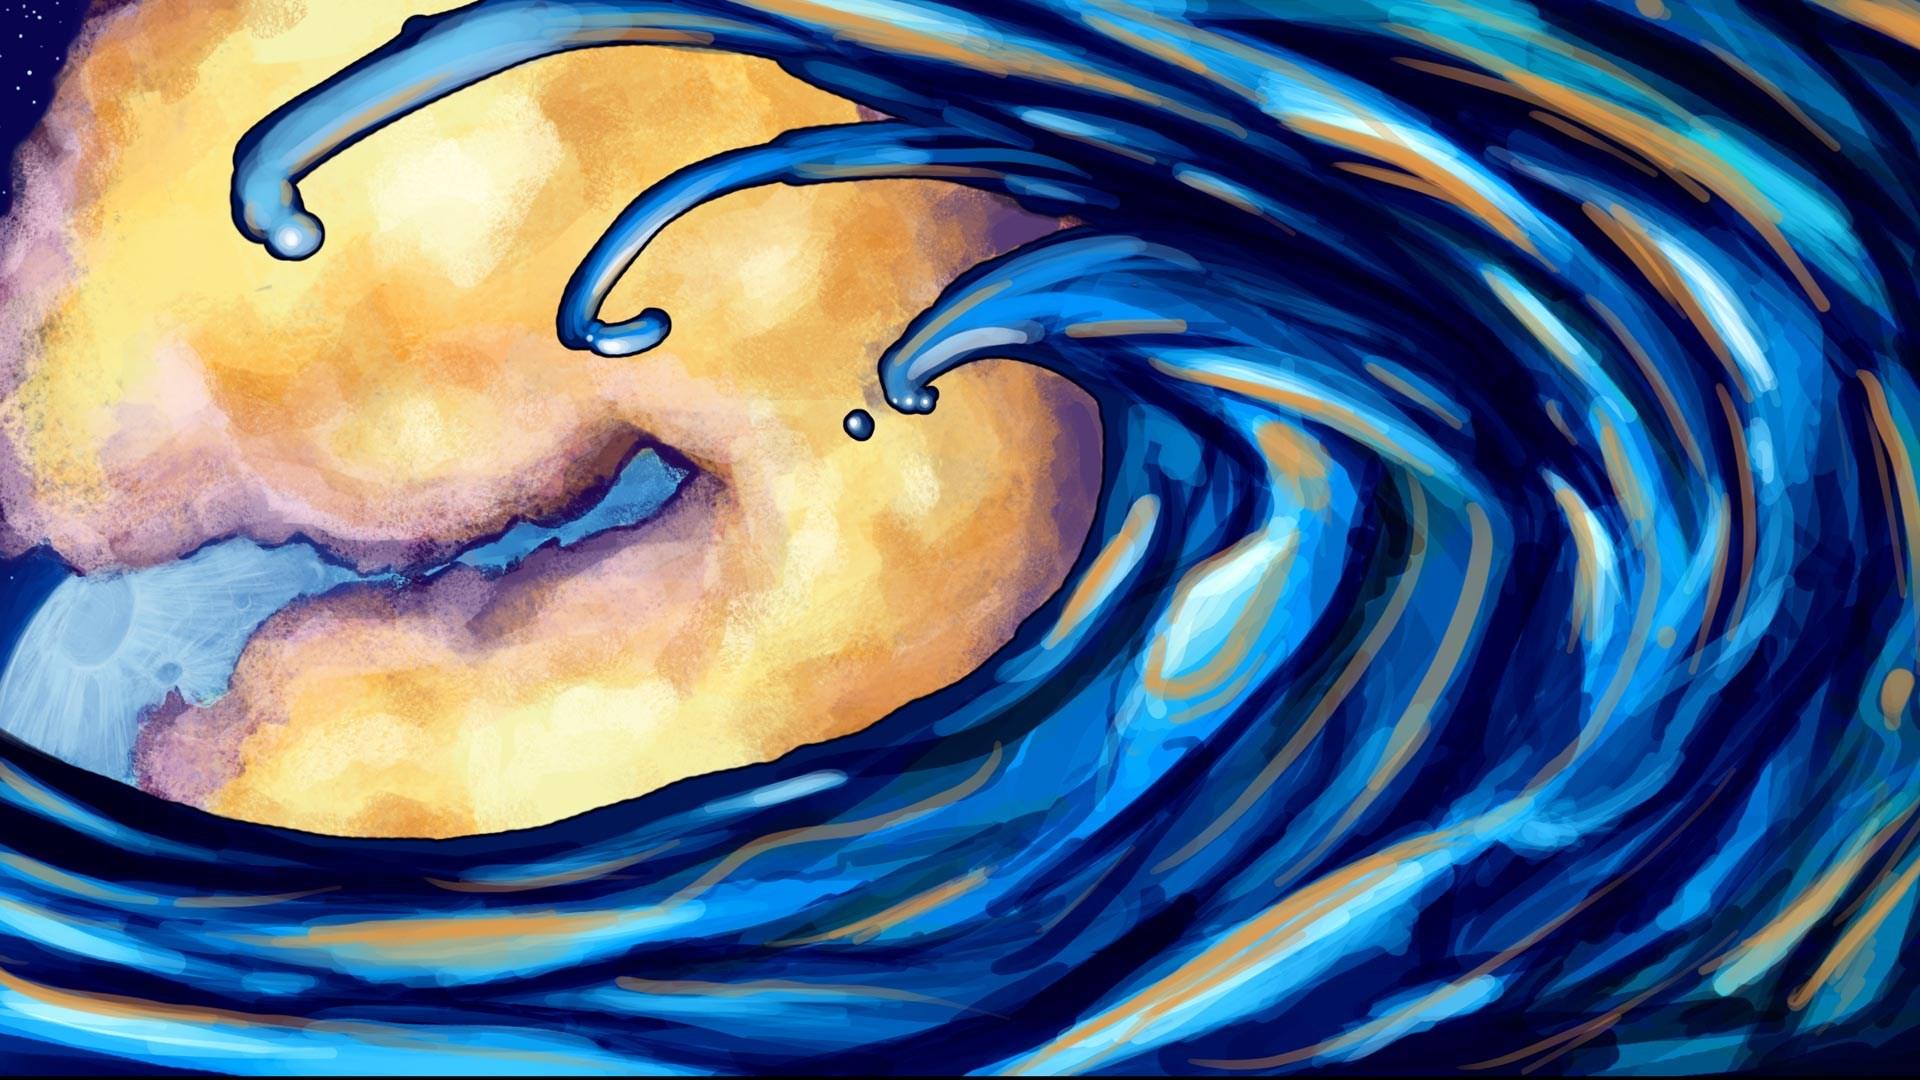 image ocean waves art hd wallpaper jpg animal jam clans wiki